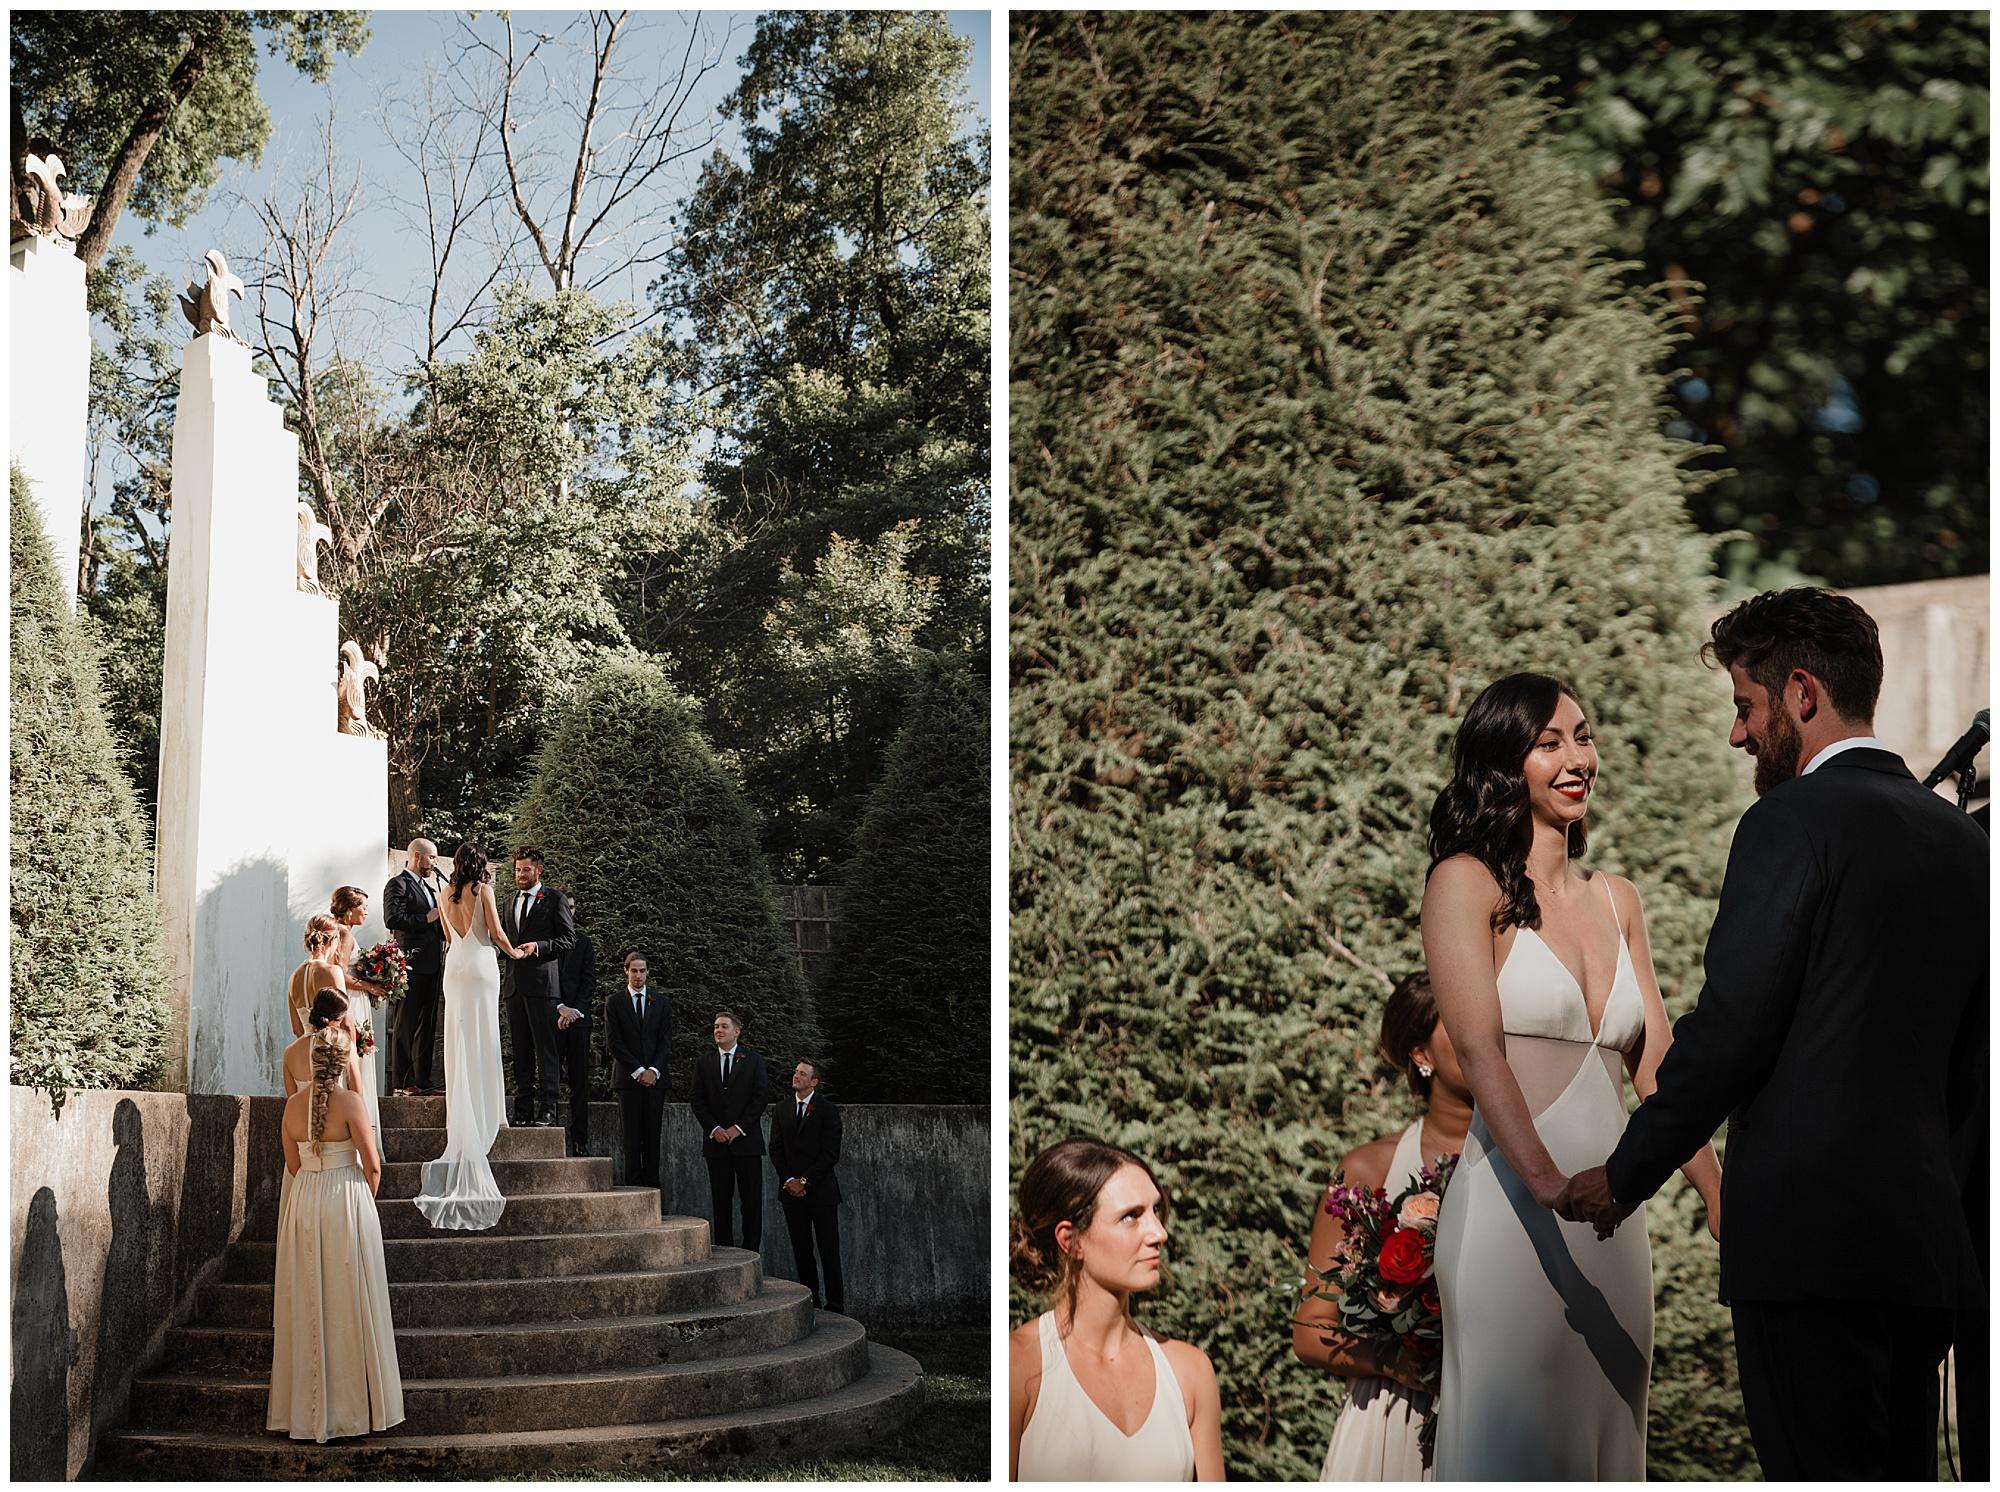 allerton_park_wedding_champaign_il_chicago_wright_photographs_ne_0031.jpg